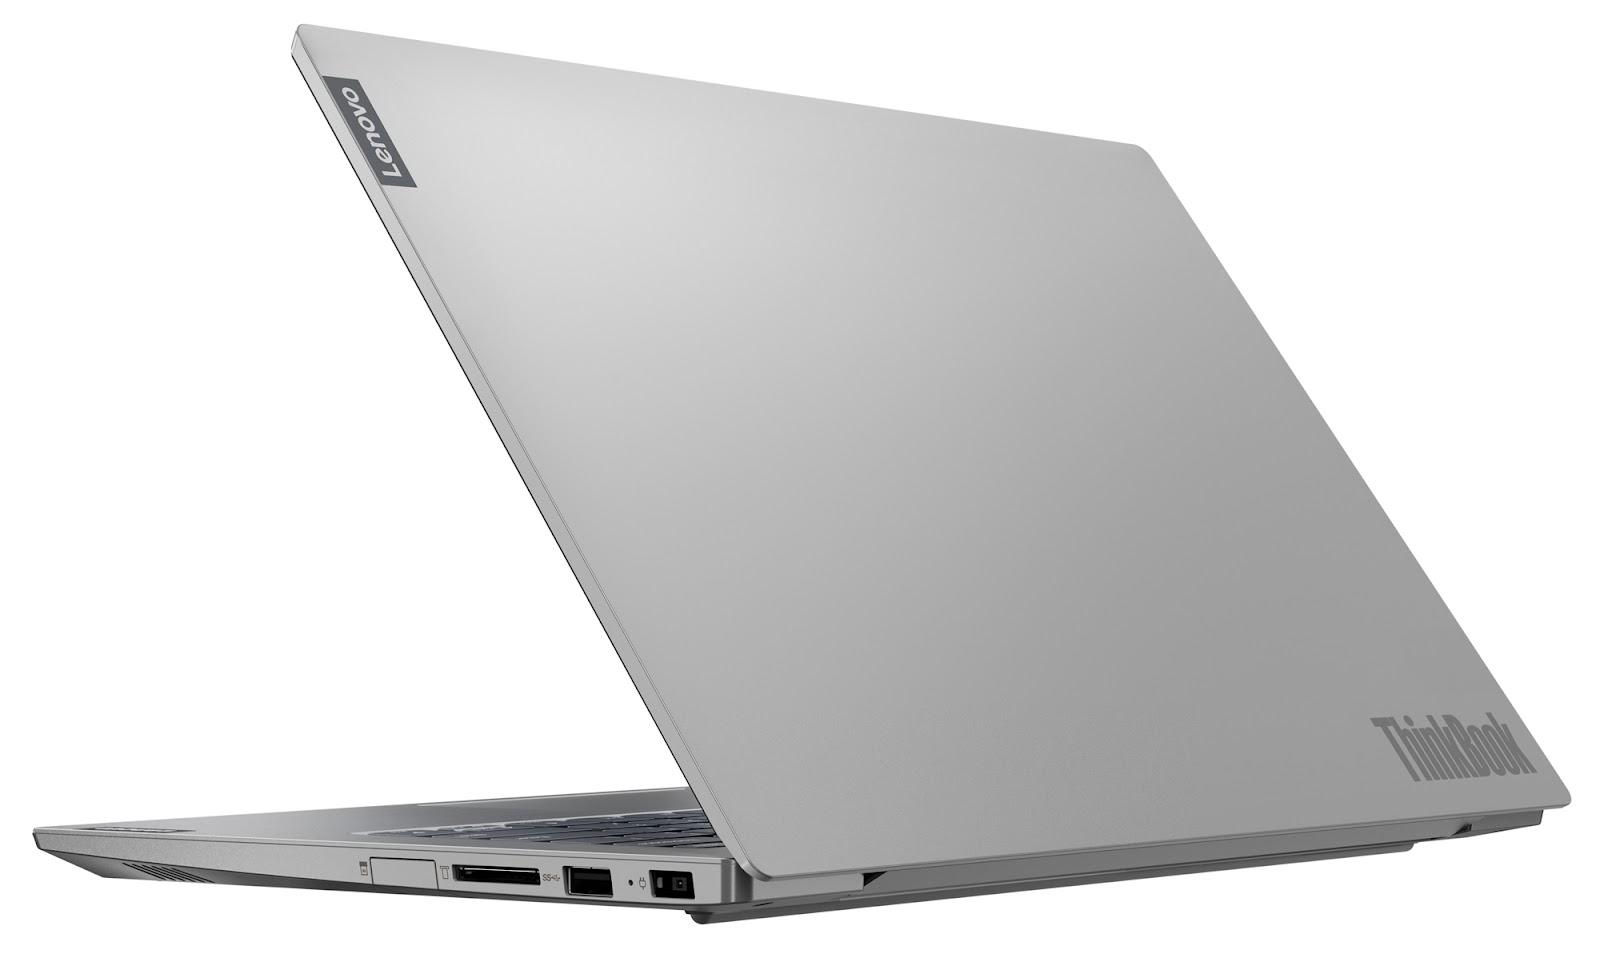 Фото 2. Ноутбук Lenovo ThinkBook 14 IIL (20SL0032RU)